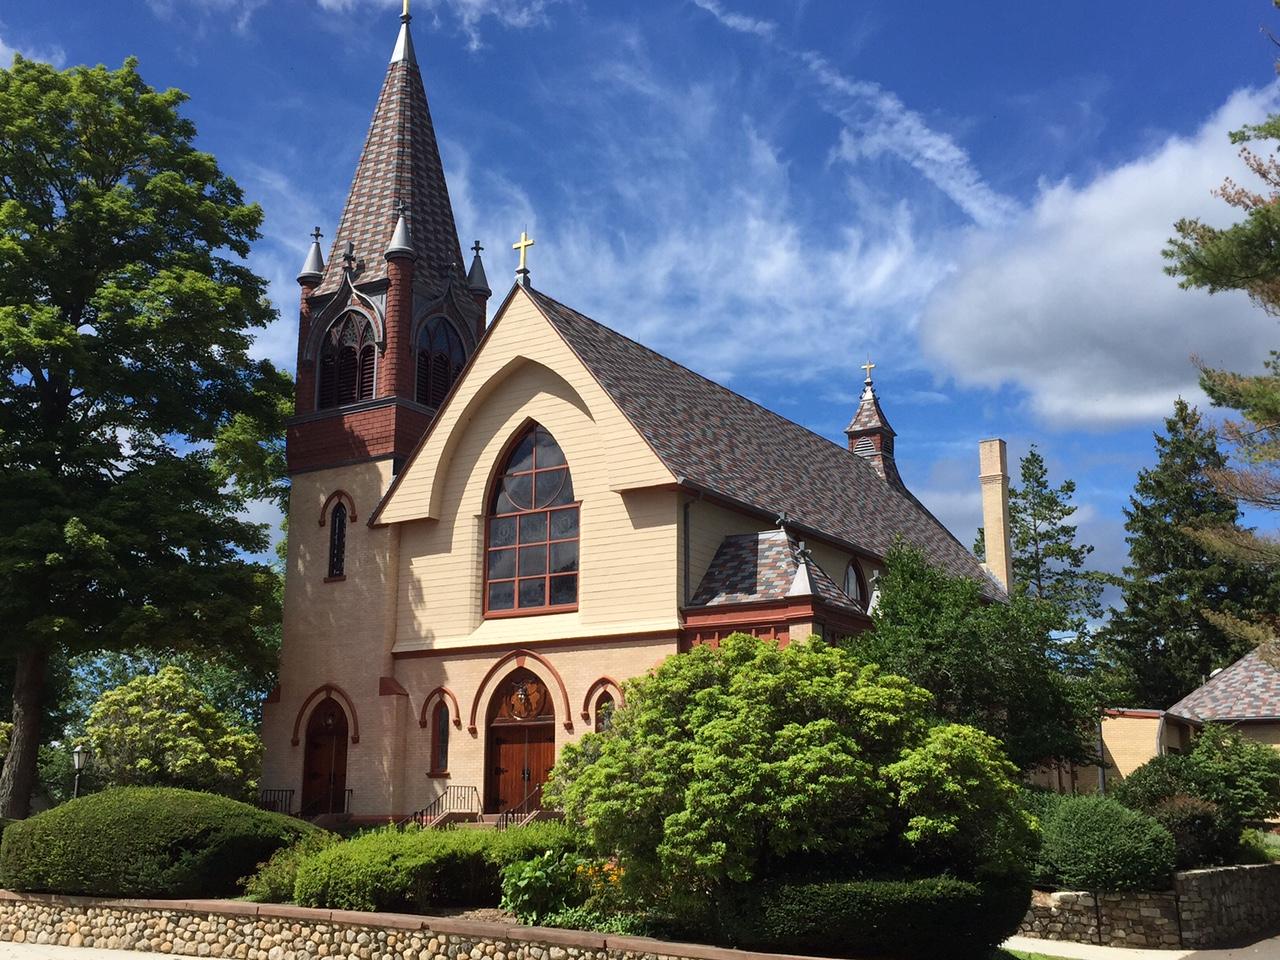 Saint Mary Parish, Ridgefield, Connecticut